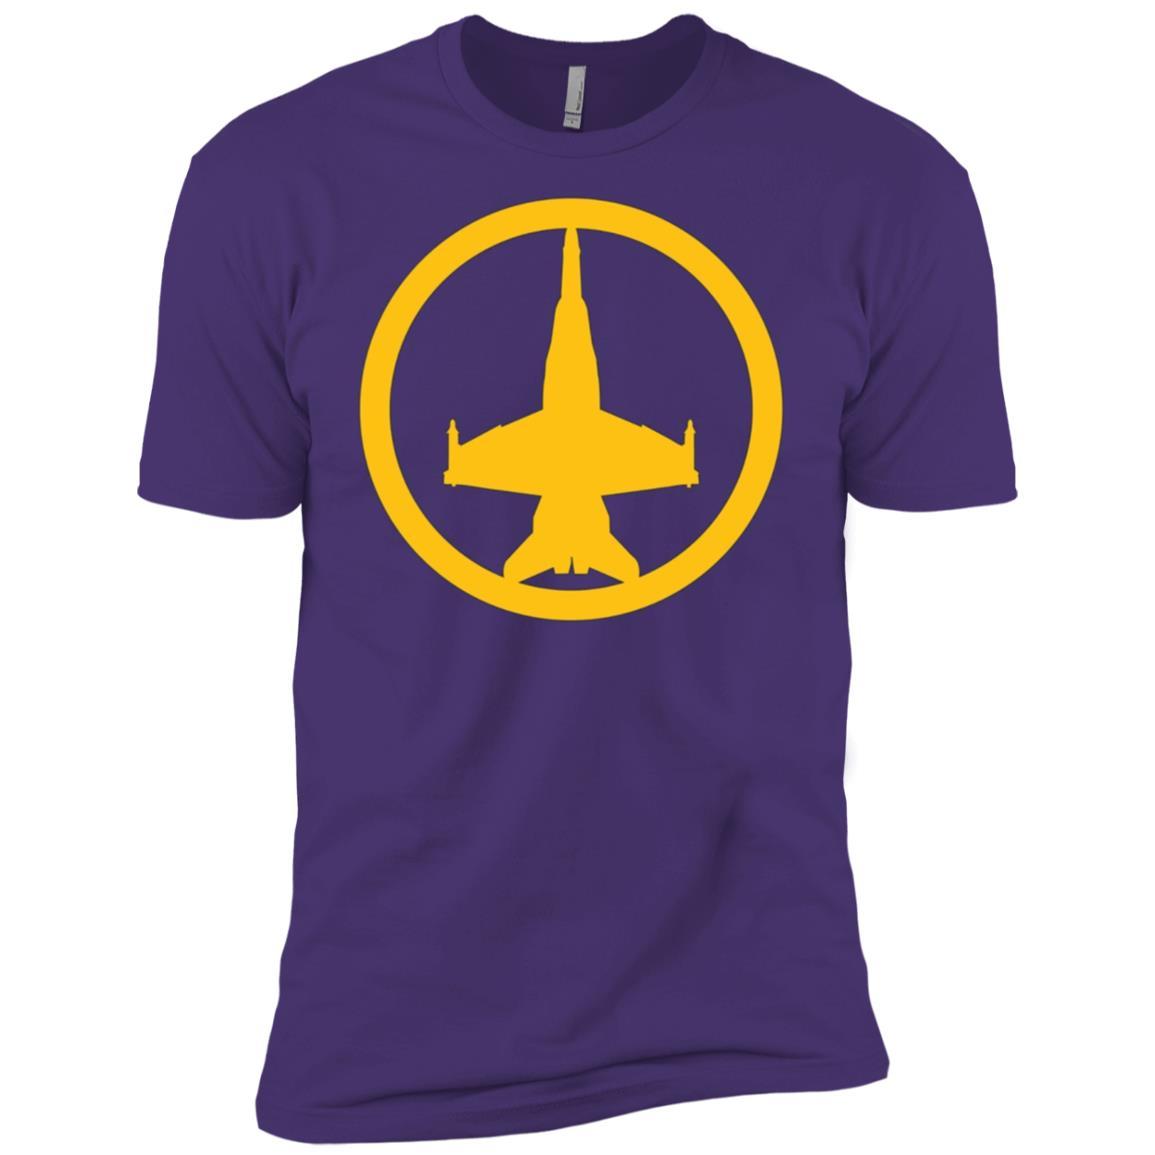 FA-18 Super Hornet (Yellow) USAF Air Supremacy Jet Men Short Sleeve T-Shirt